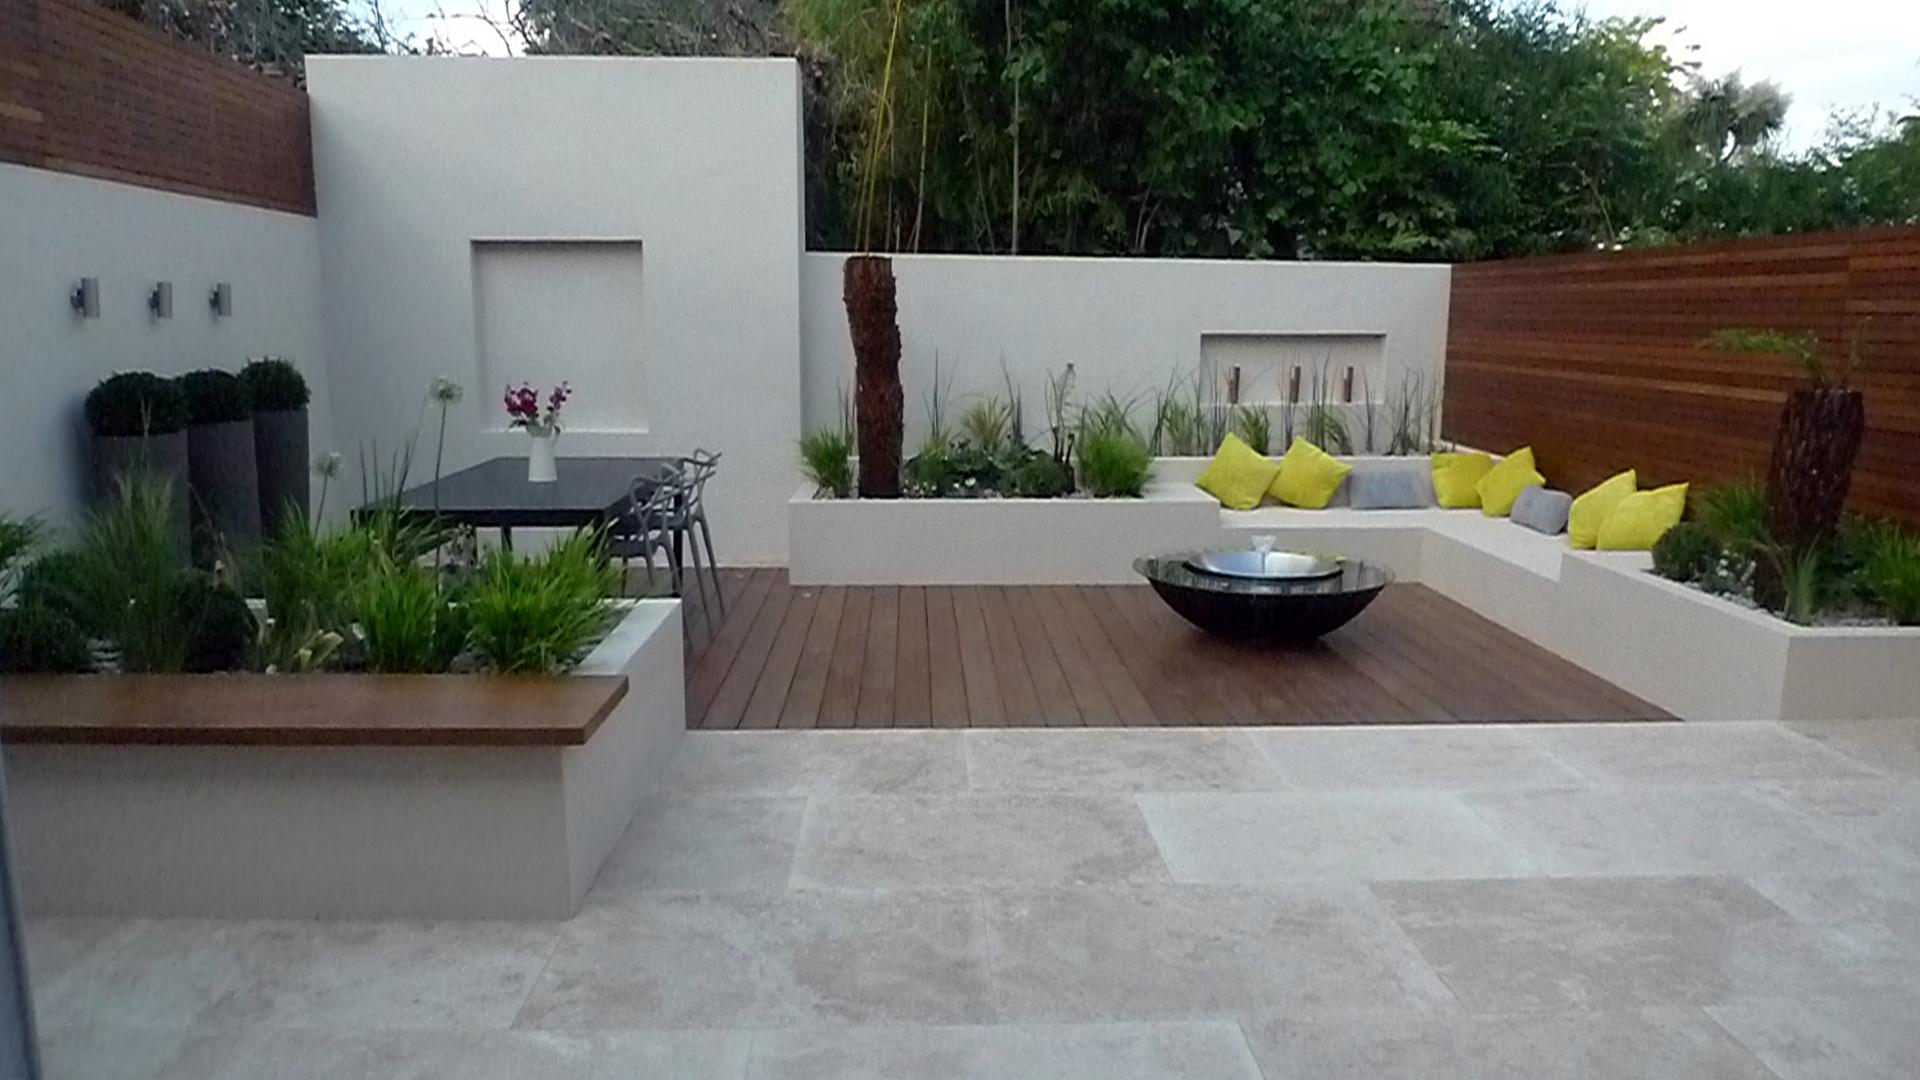 Modern Garden Design Cat Howard - London Garden Blog on Modern Small Backyard Ideas id=79206